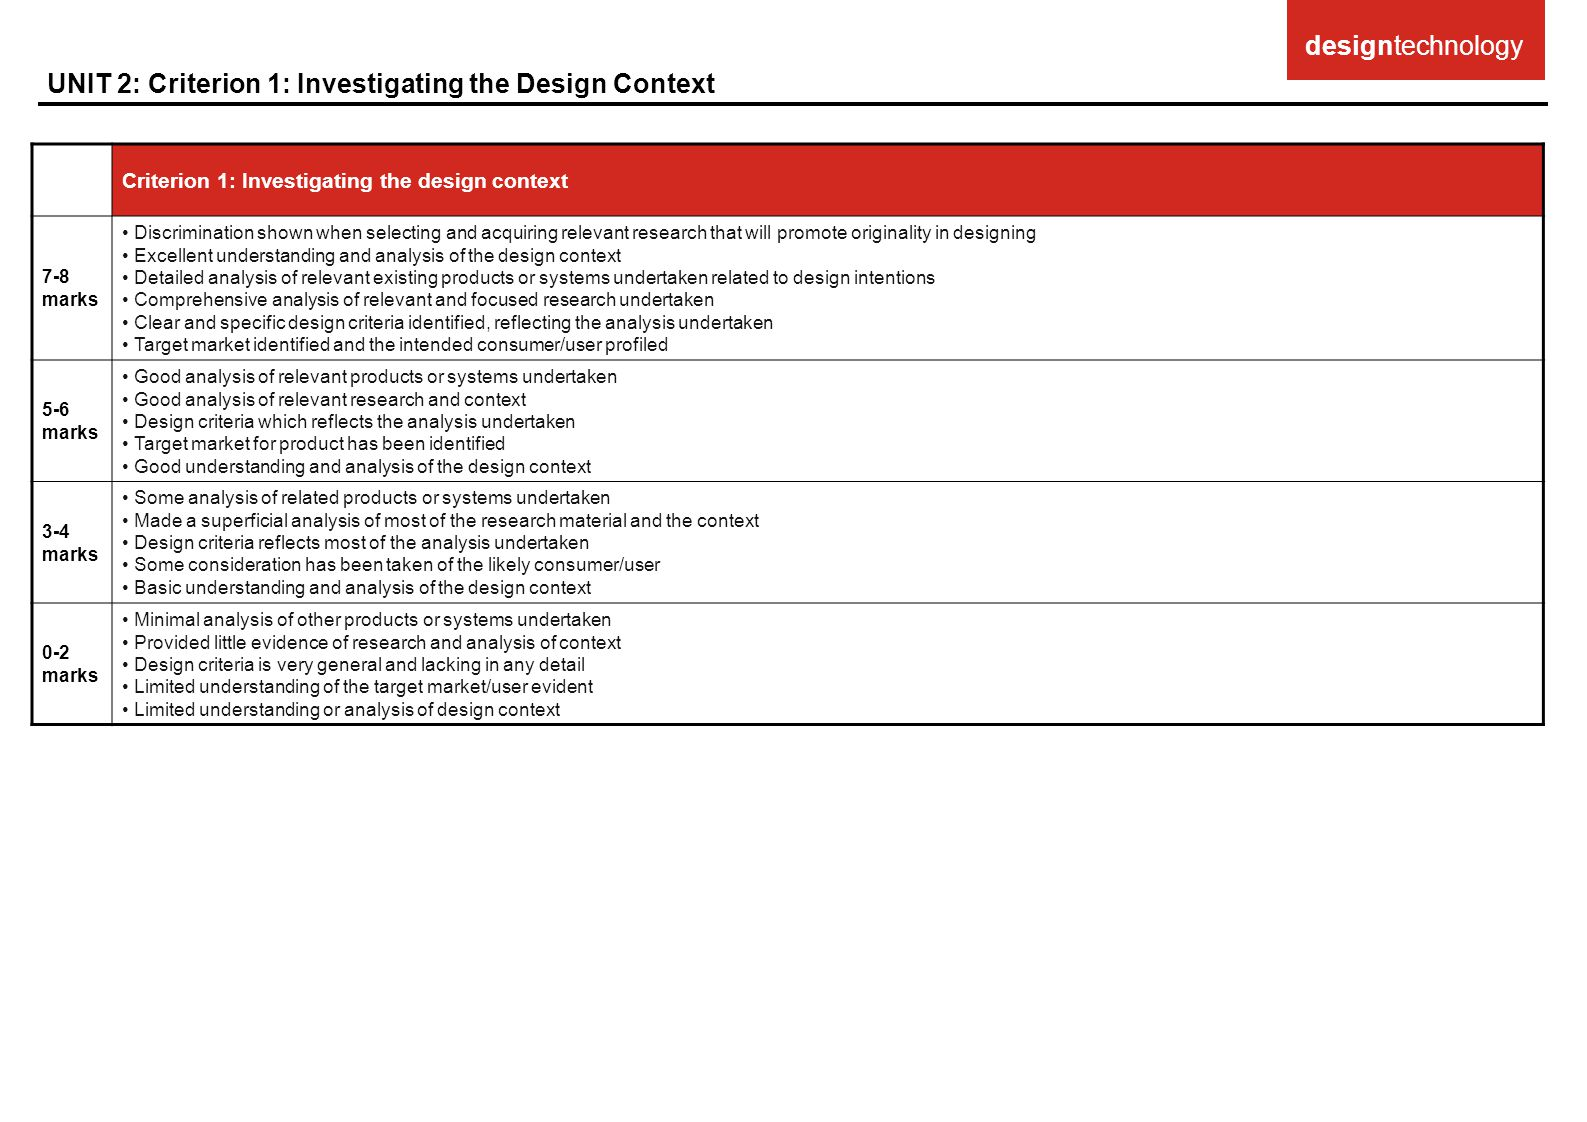 UNIT 2: Criterion 1: Investigating the Design Context